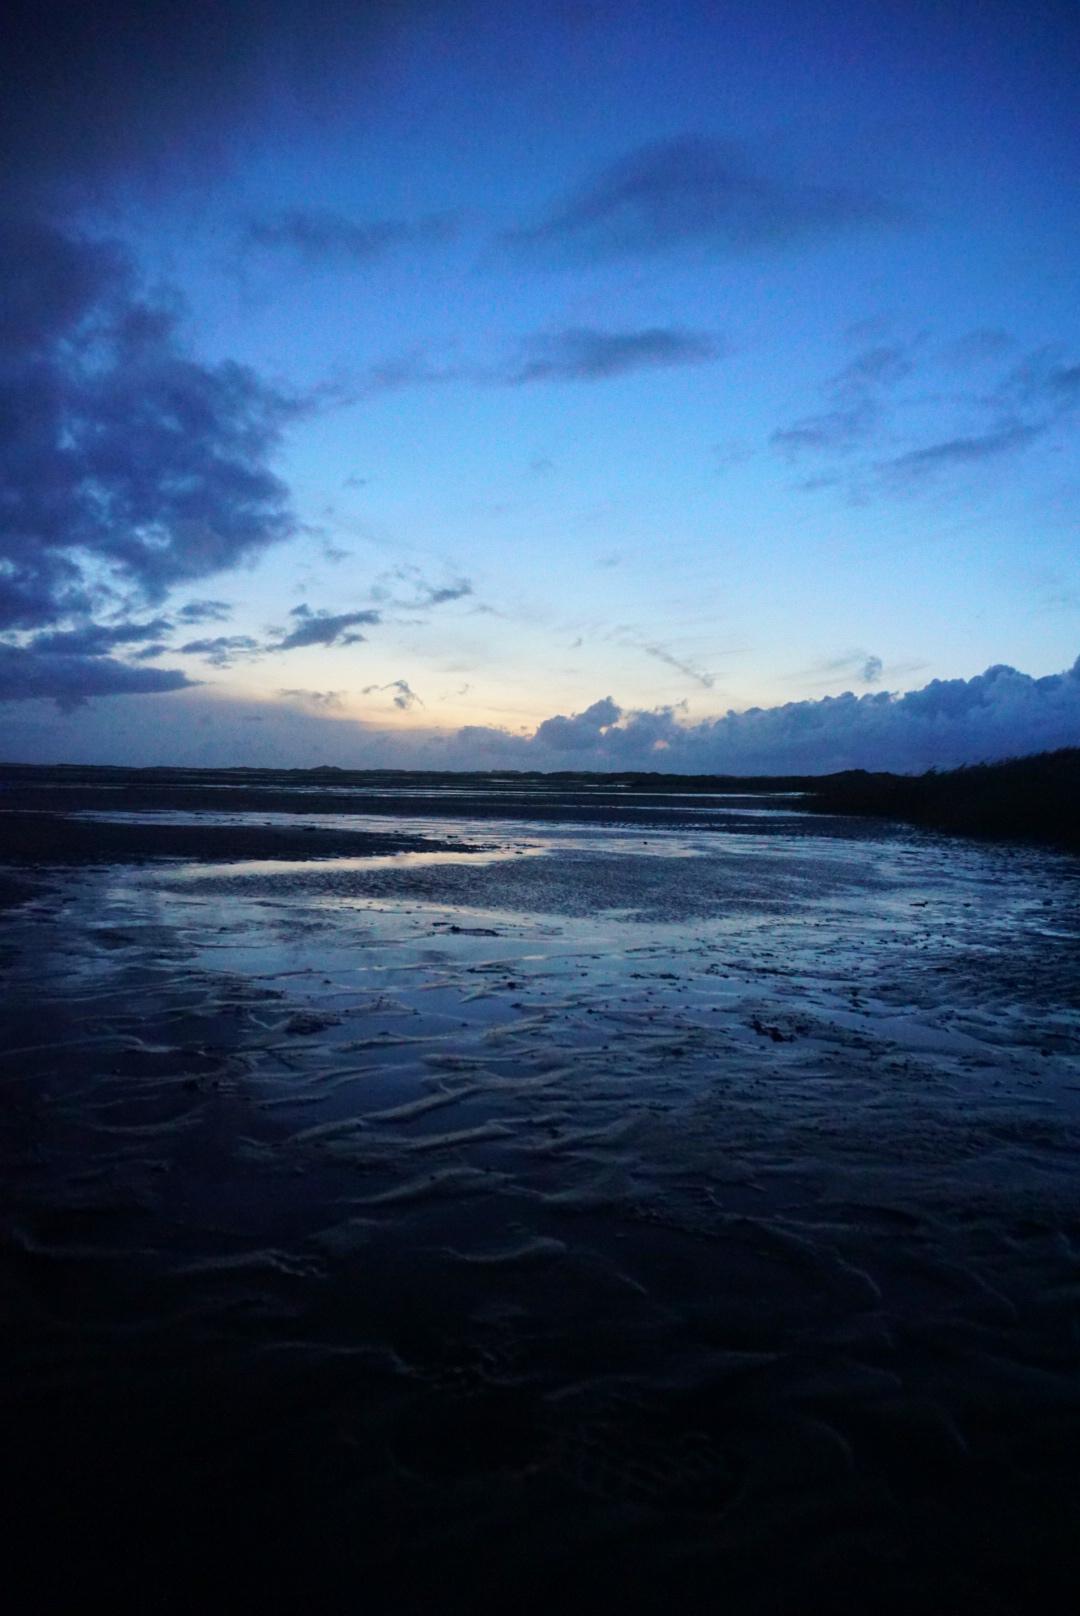 Wad Islands - The Netherlands - Sunset